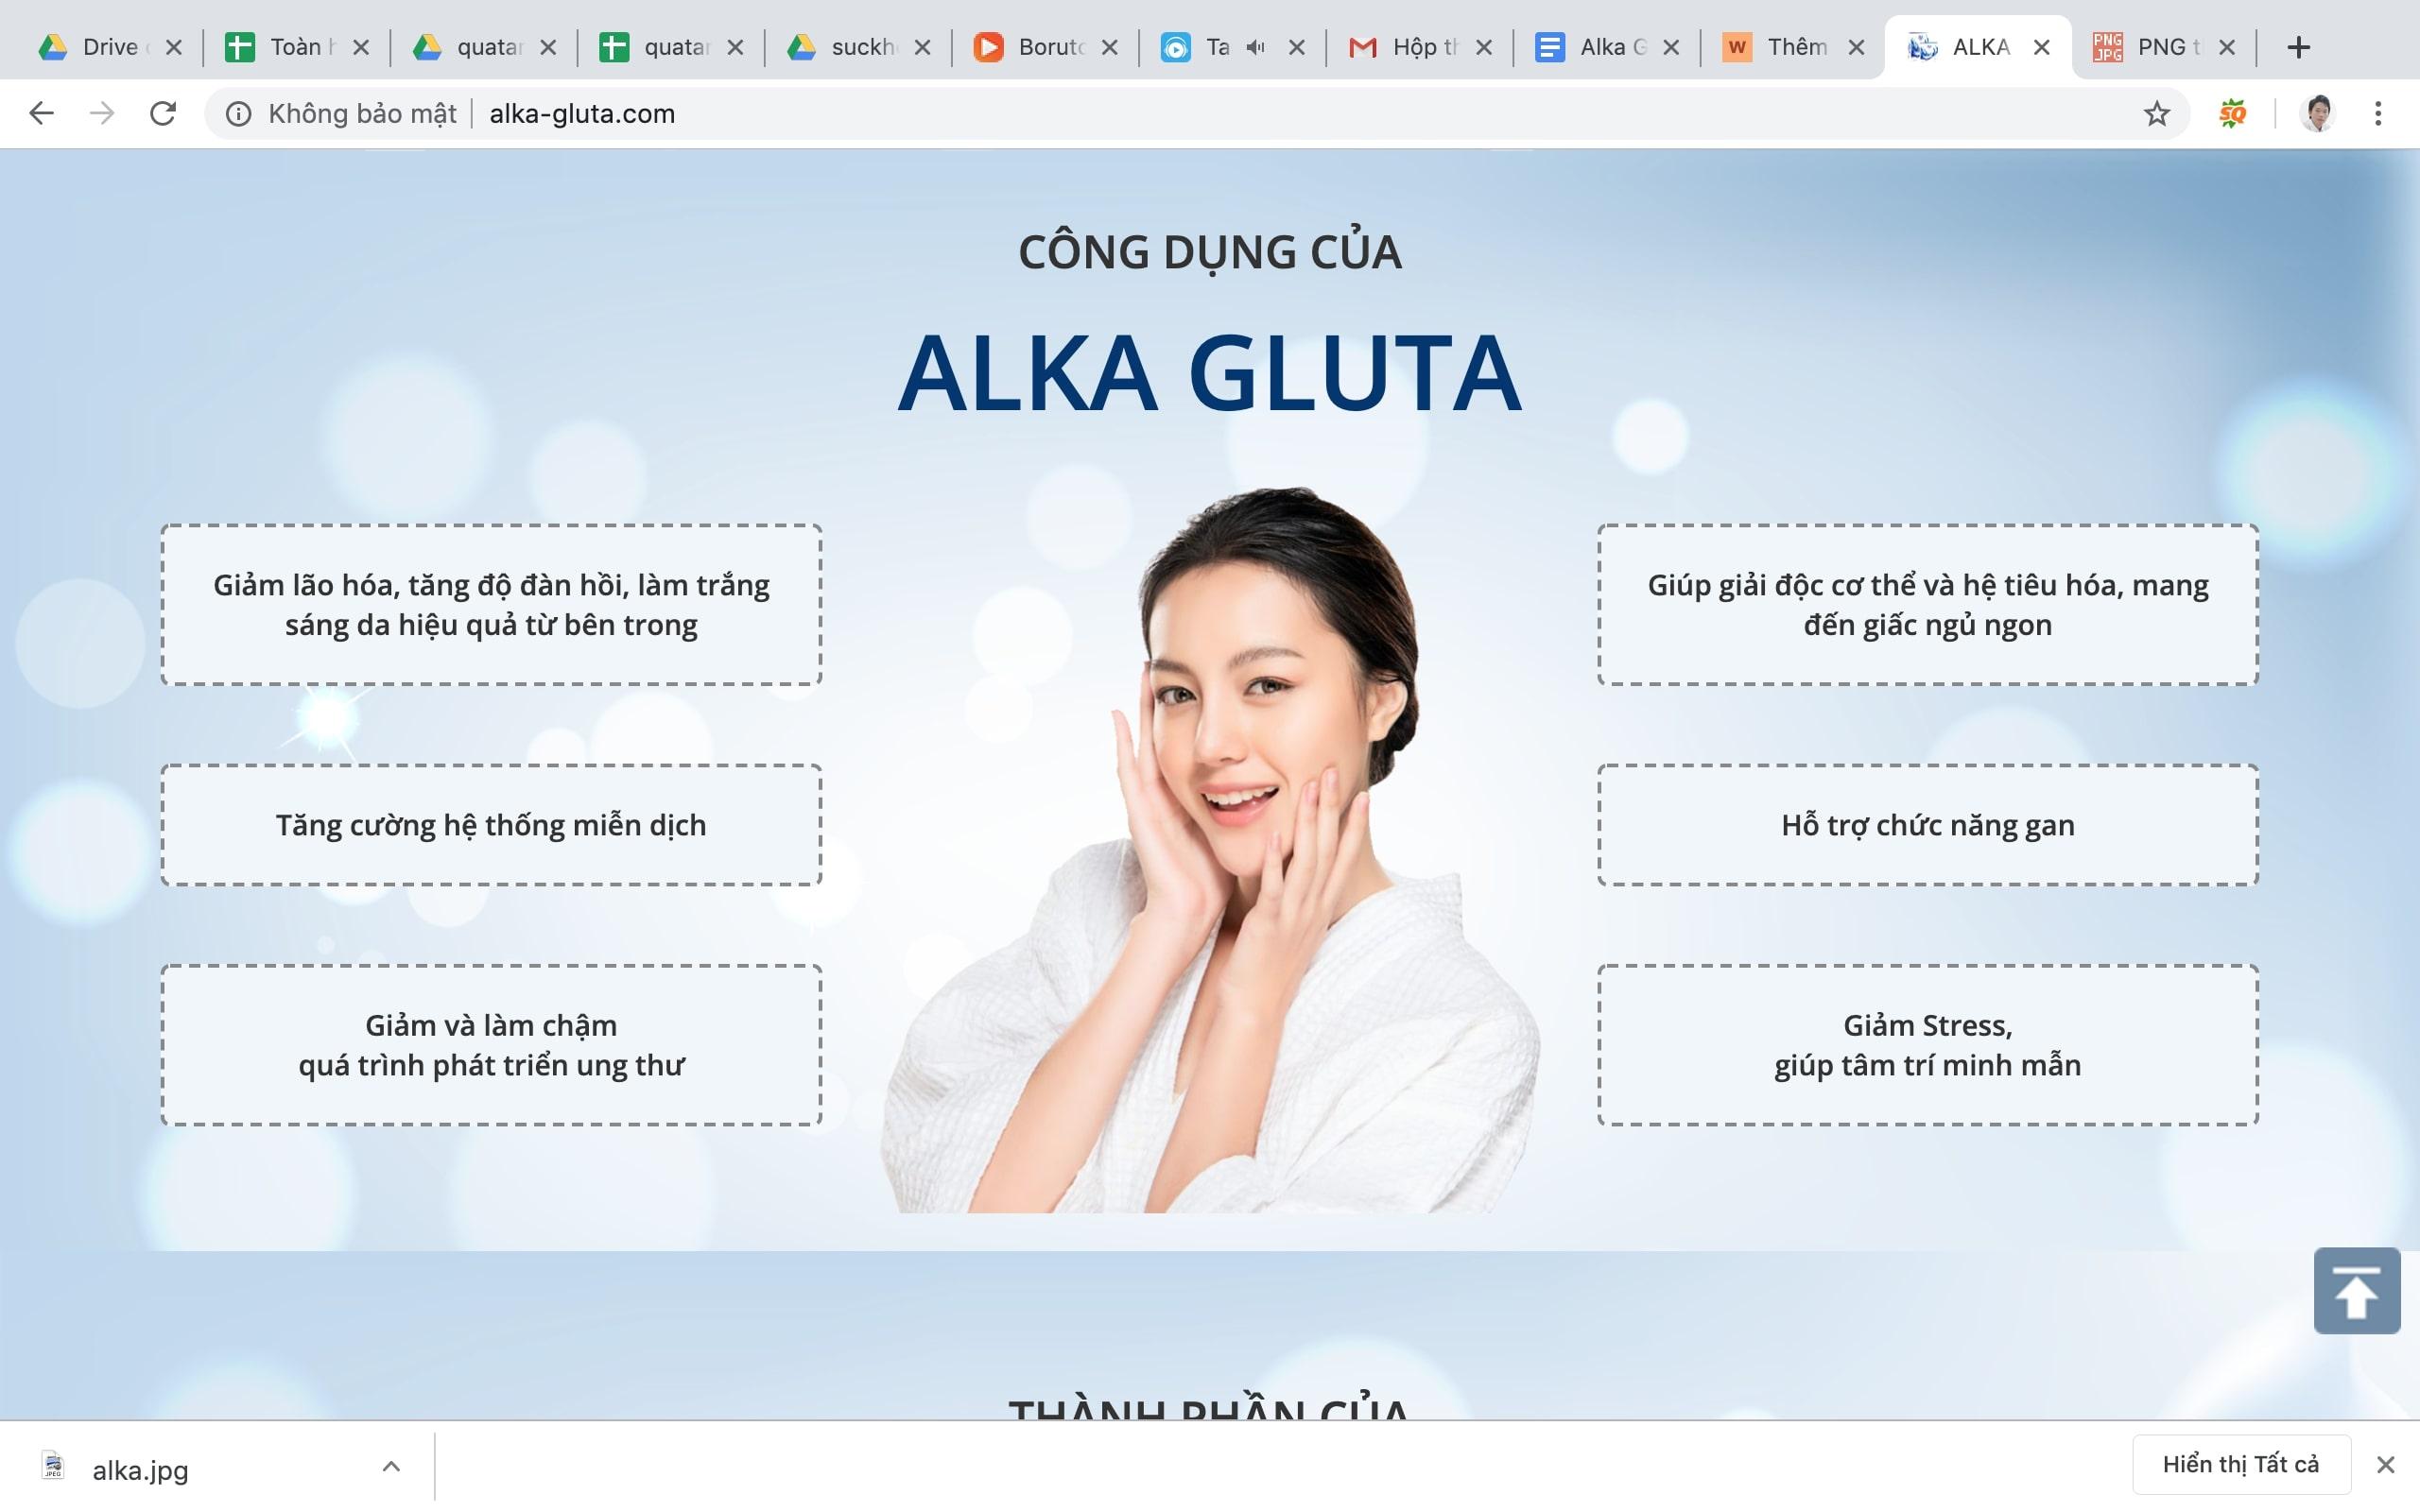 alka-gluta